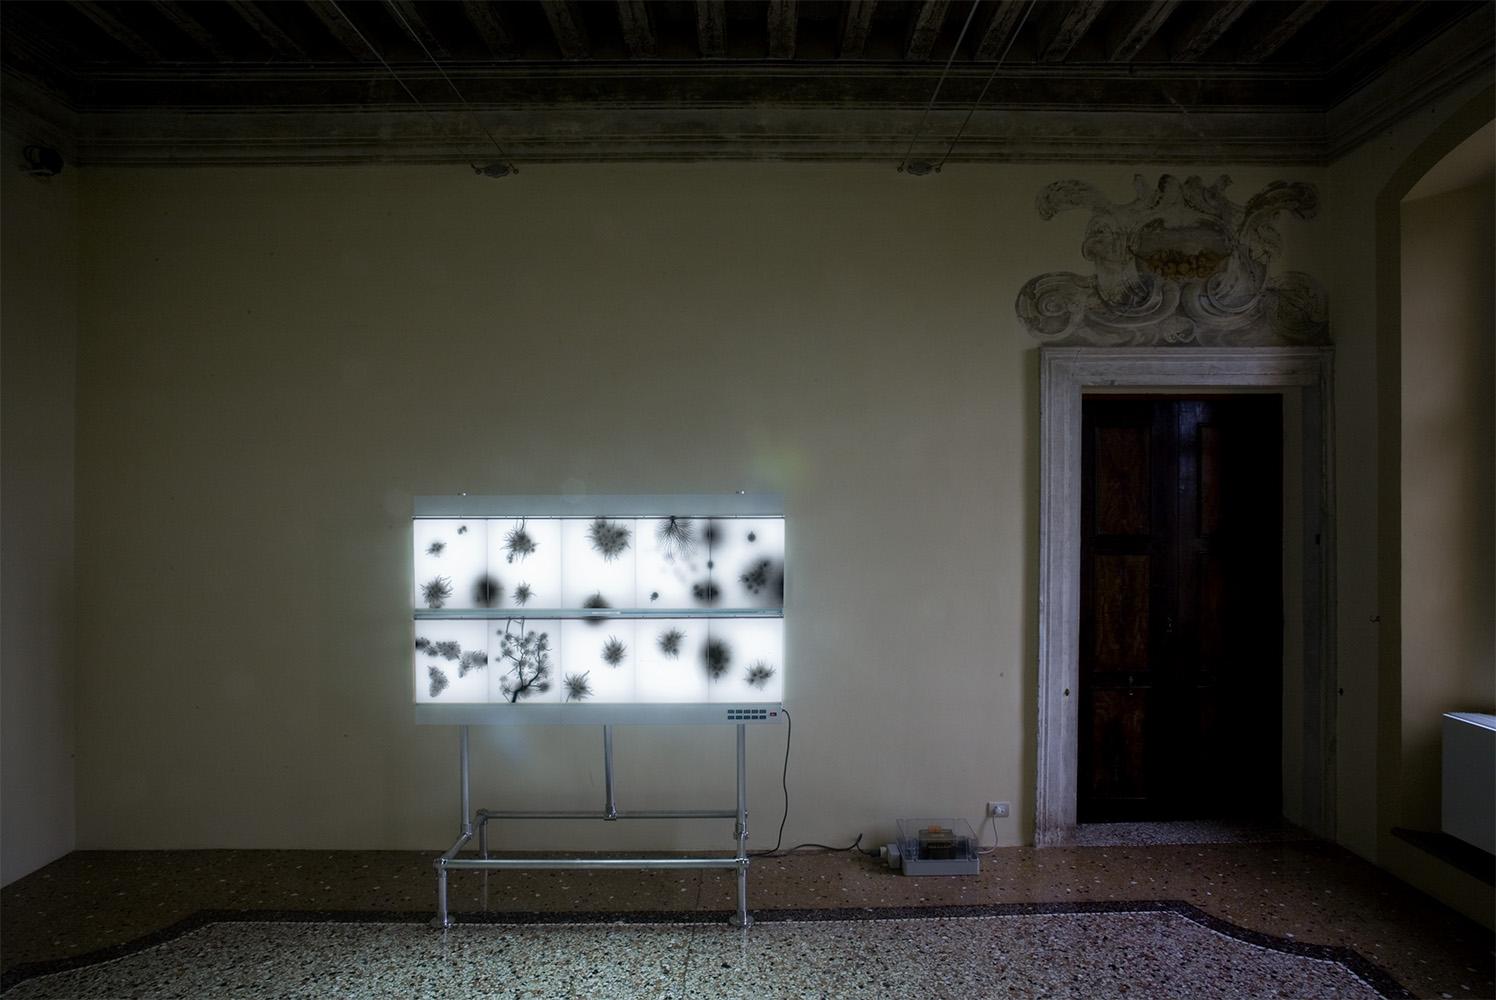 Lightning Fileds Illuminated 001, 2007  (installation view at Villa Manin Centro d'Arte Contemporanea,2007)